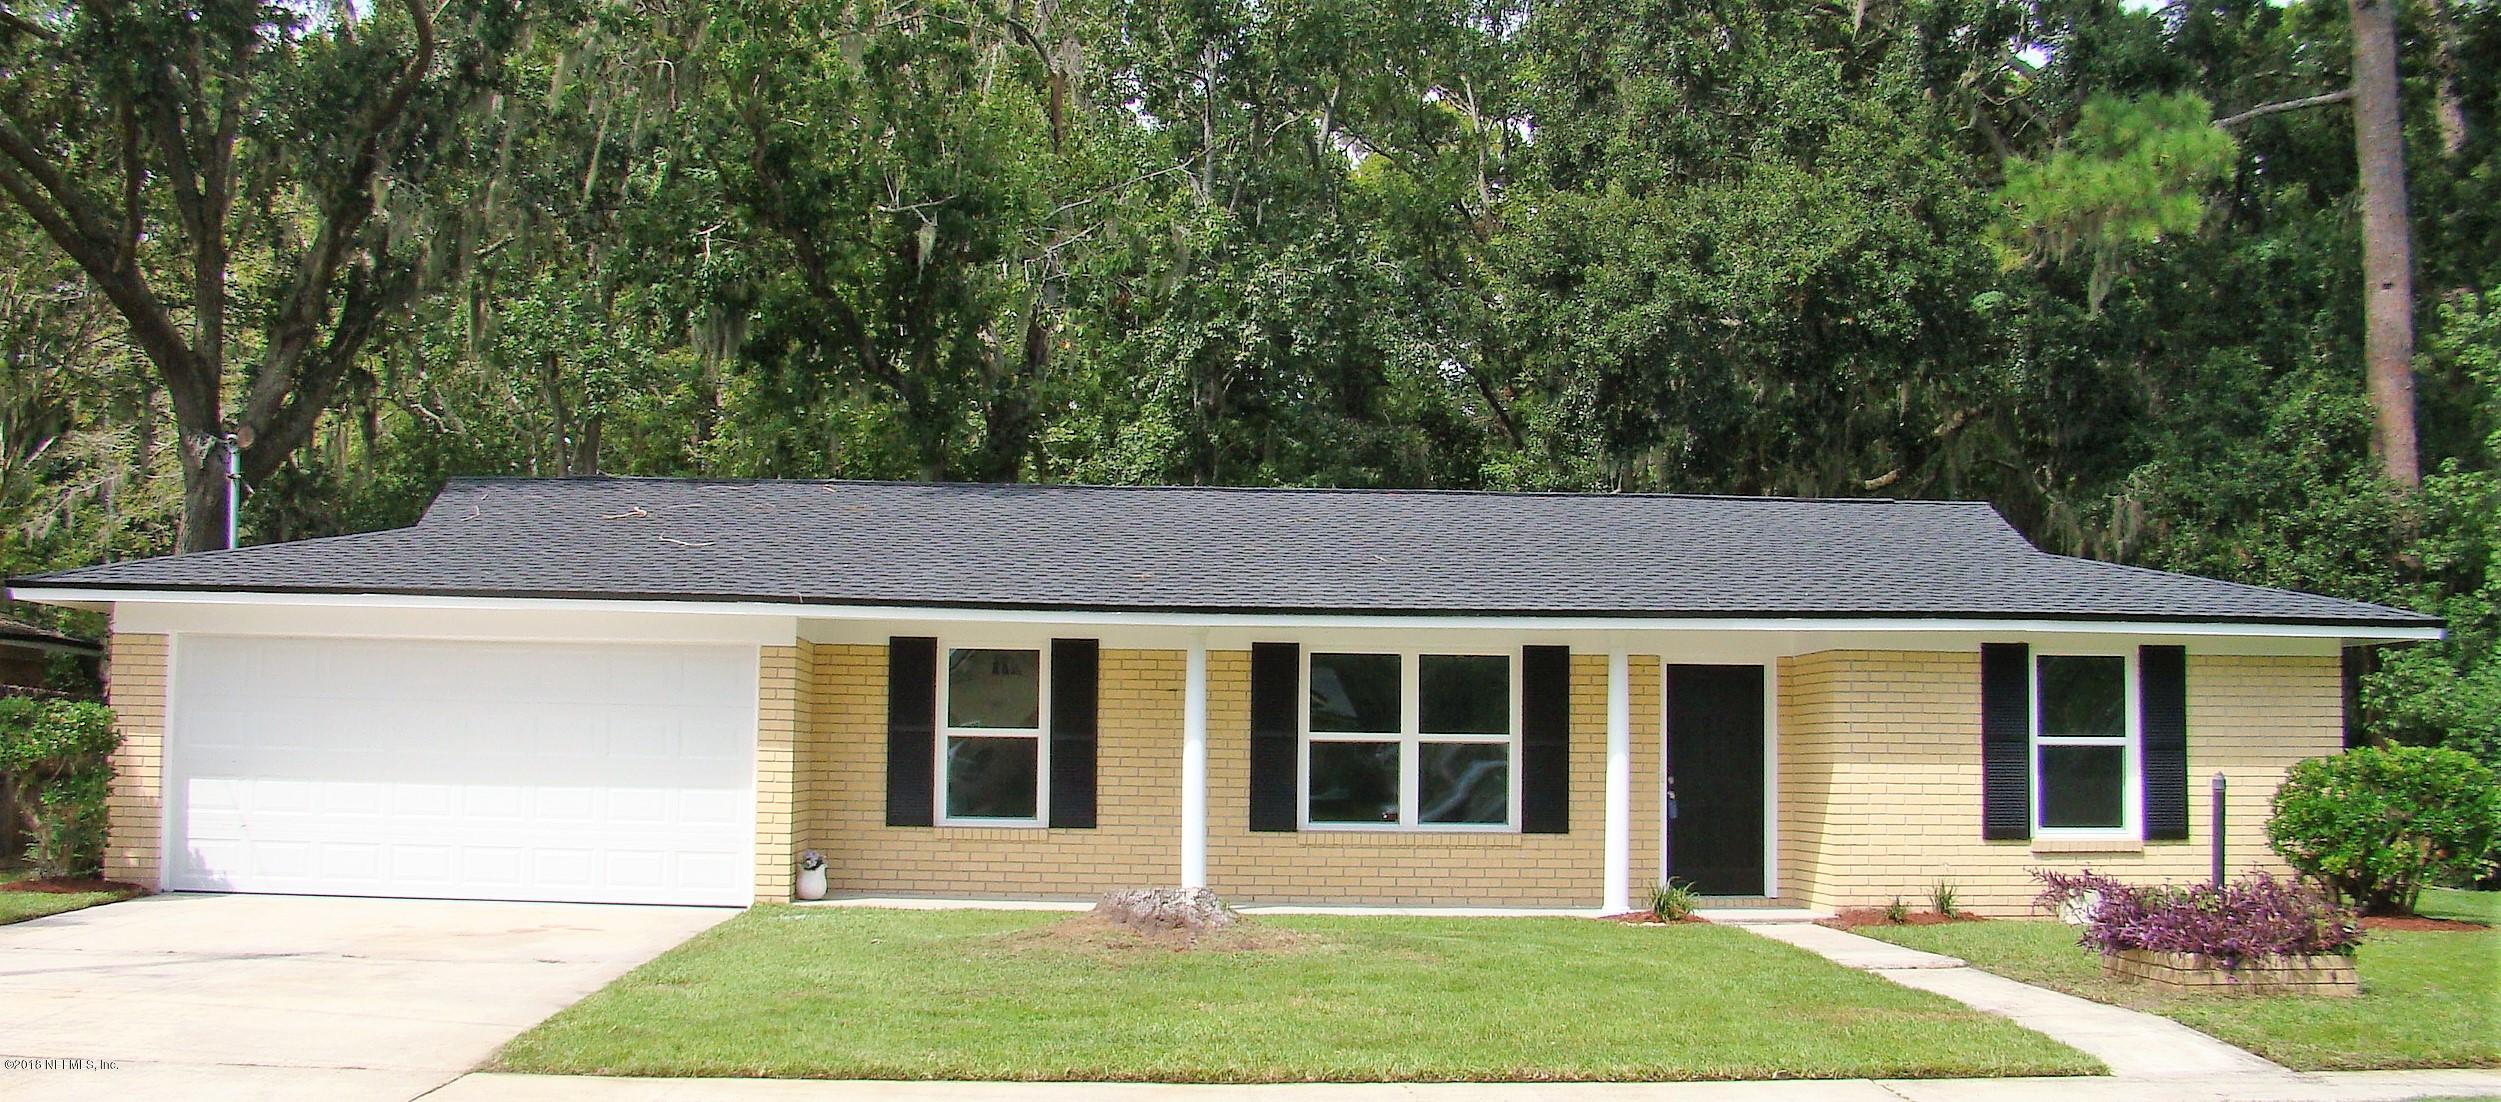 1270 ARBOR, ORANGE PARK, FLORIDA 32073, 3 Bedrooms Bedrooms, ,2 BathroomsBathrooms,Residential - single family,For sale,ARBOR,957407